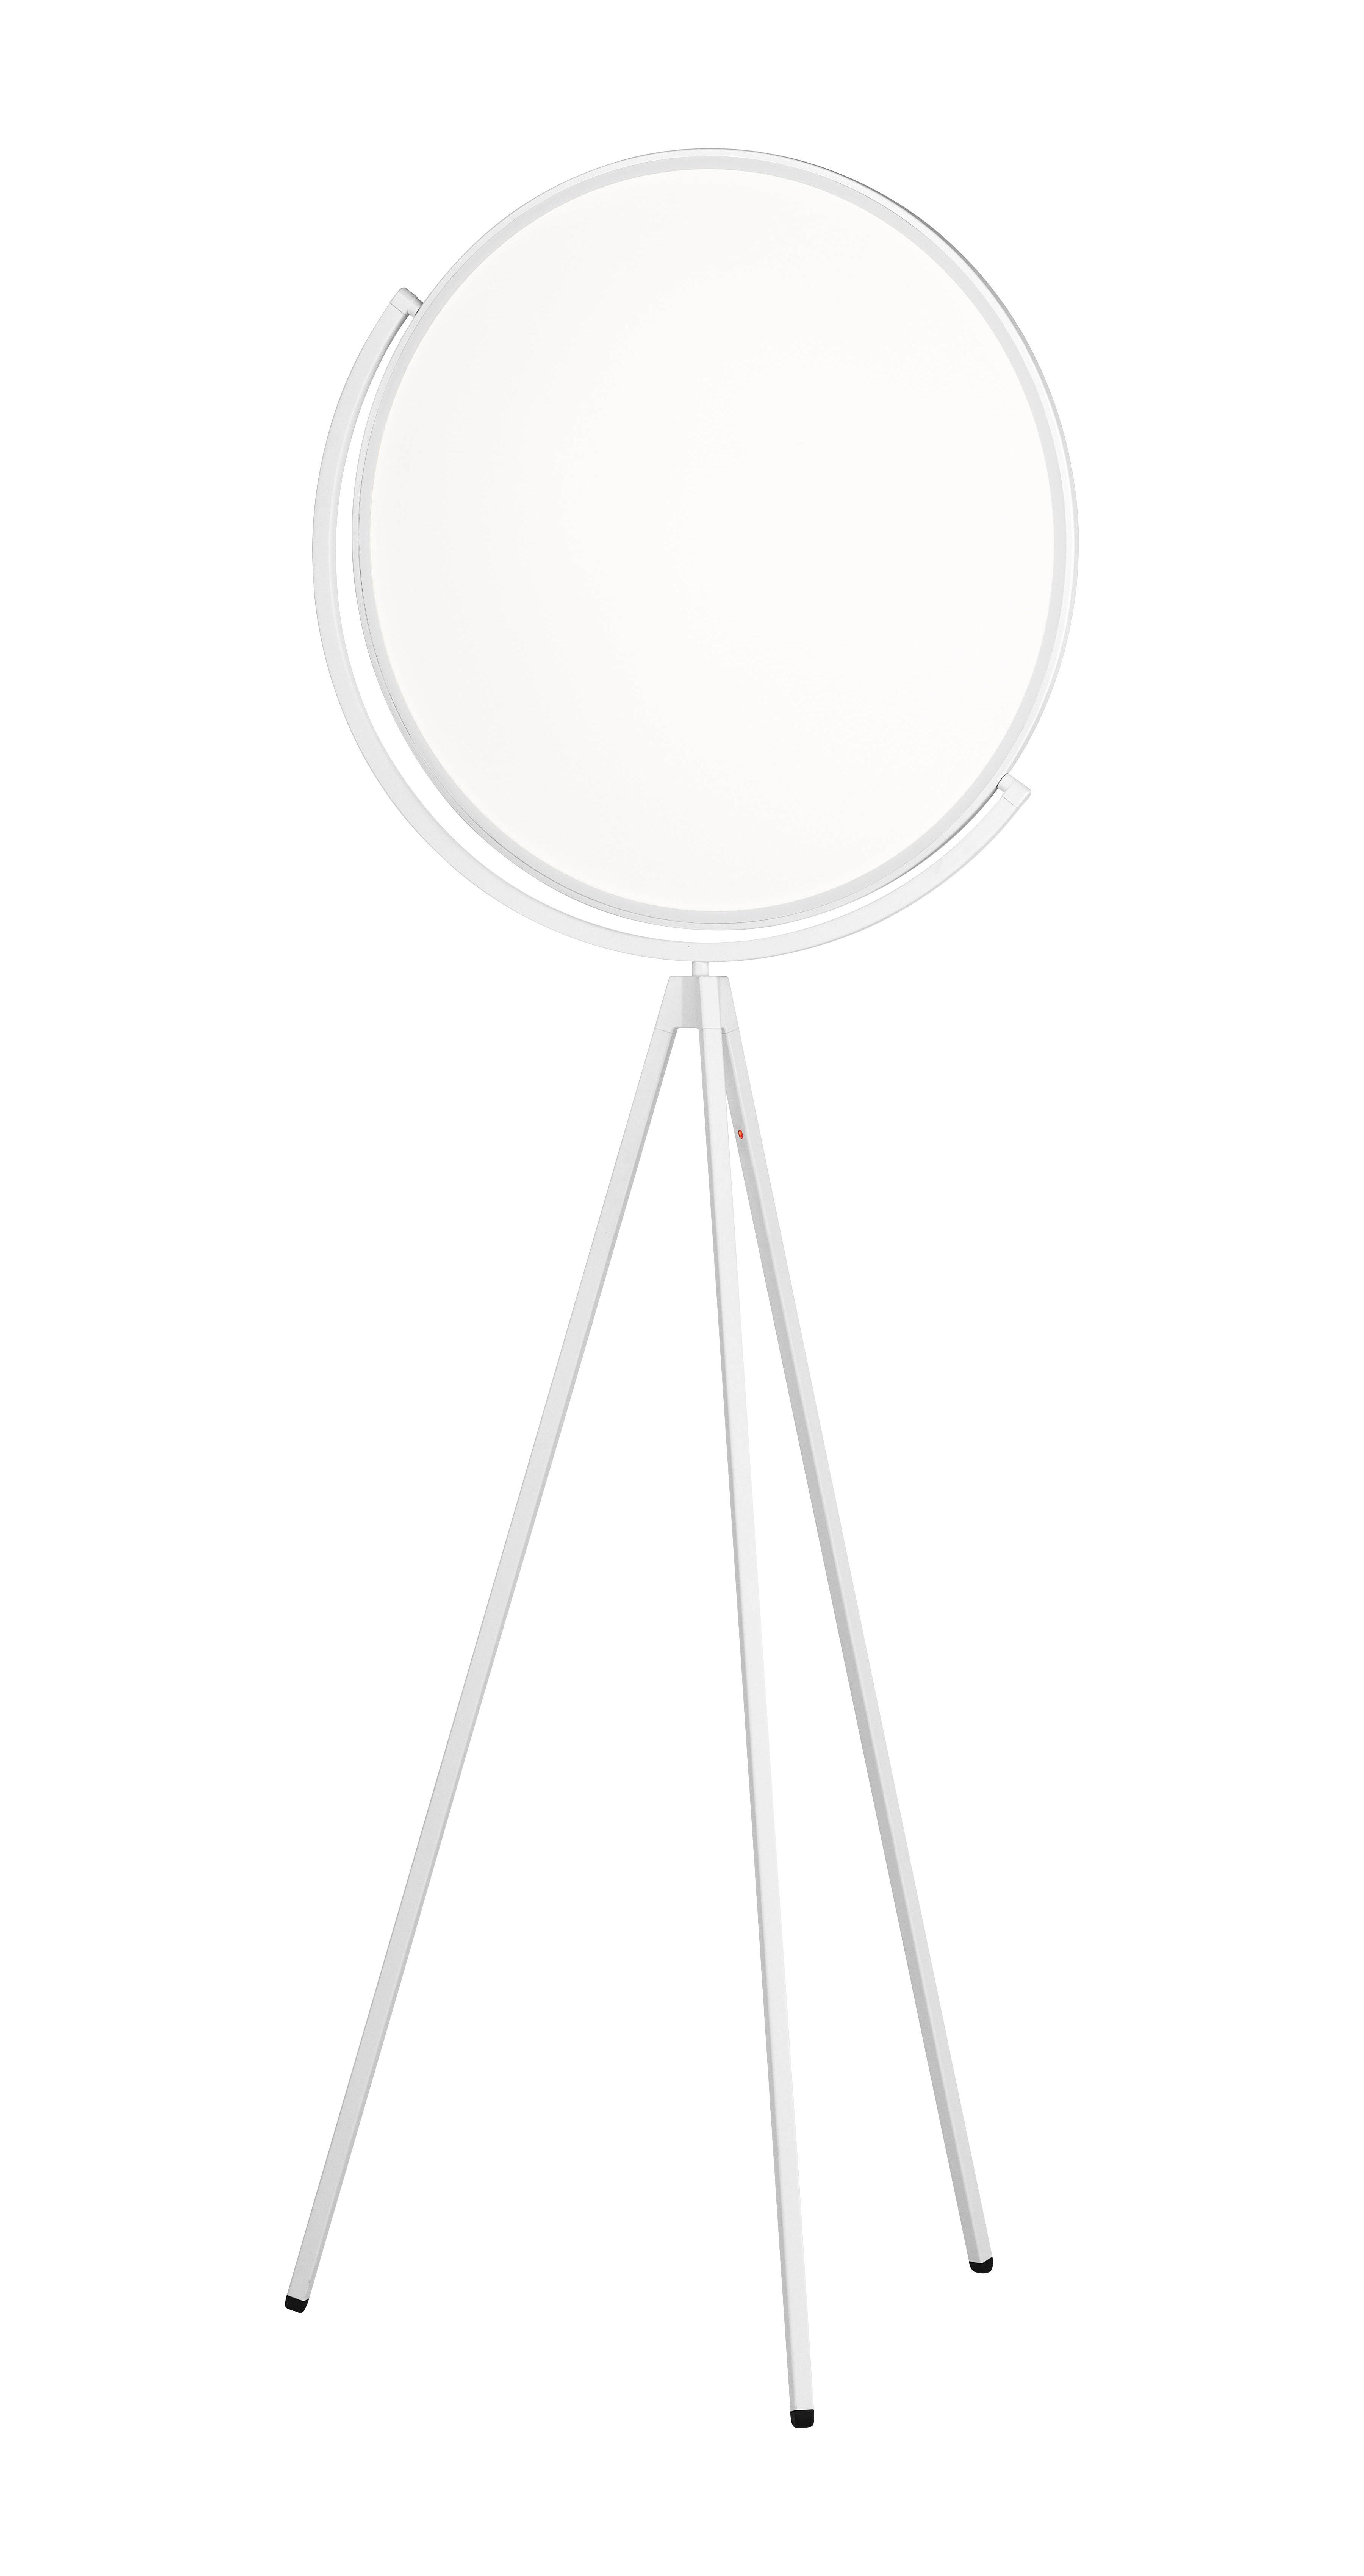 Lighting - Floor lamps - Superloon LED Floor lamp - H 197 cm by Flos - White - Painted aluminium, PMMA